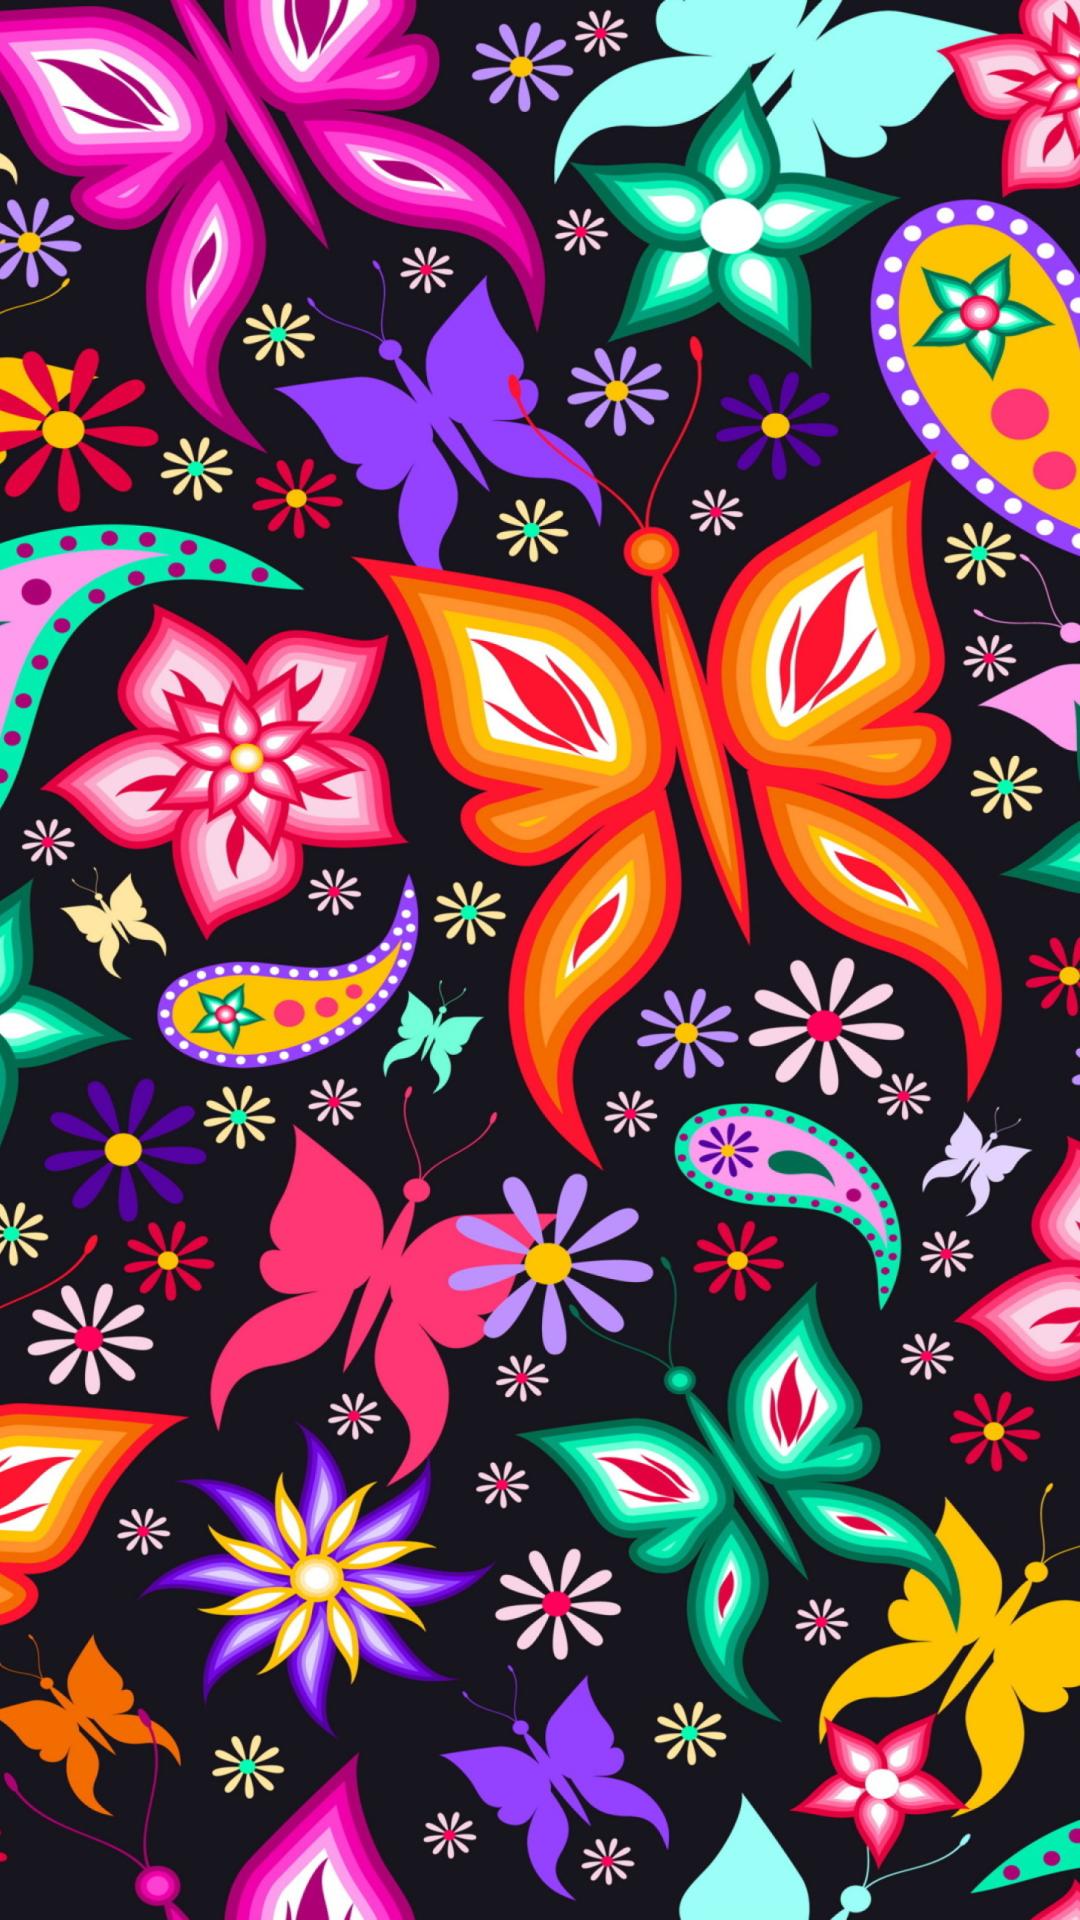 Floral Butterflies Wallpaper For Iphone 6 Plus